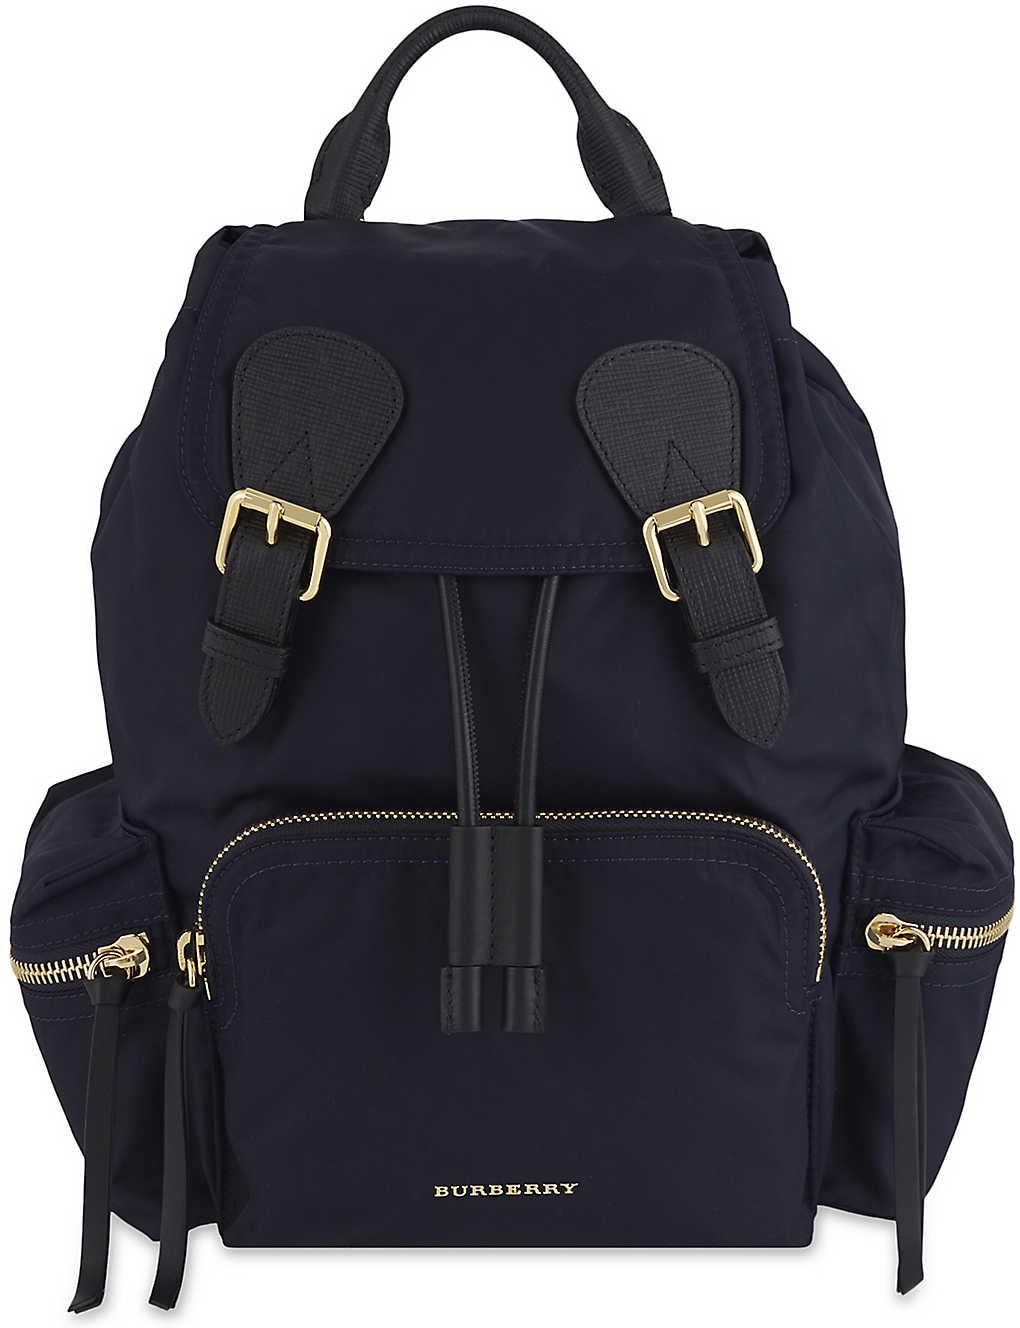 6bcf7df3f466 BURBERRY - Medium nylon backpack